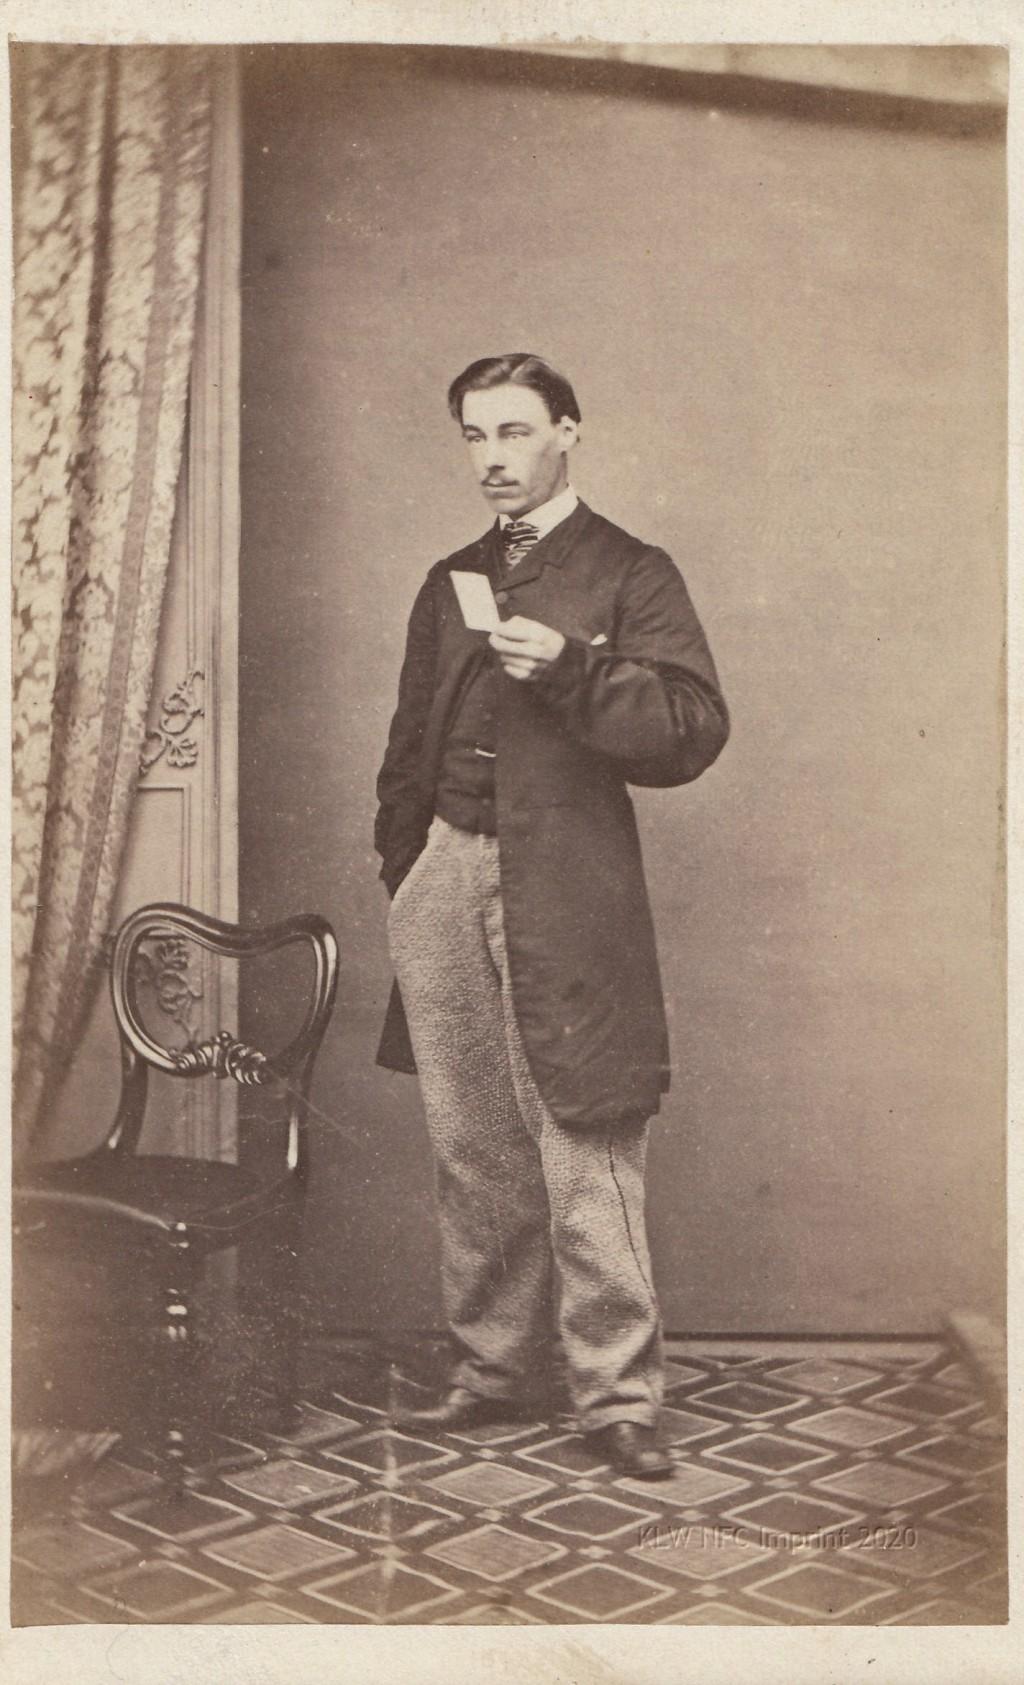 Alfred Mayson 1865 by A. Bock